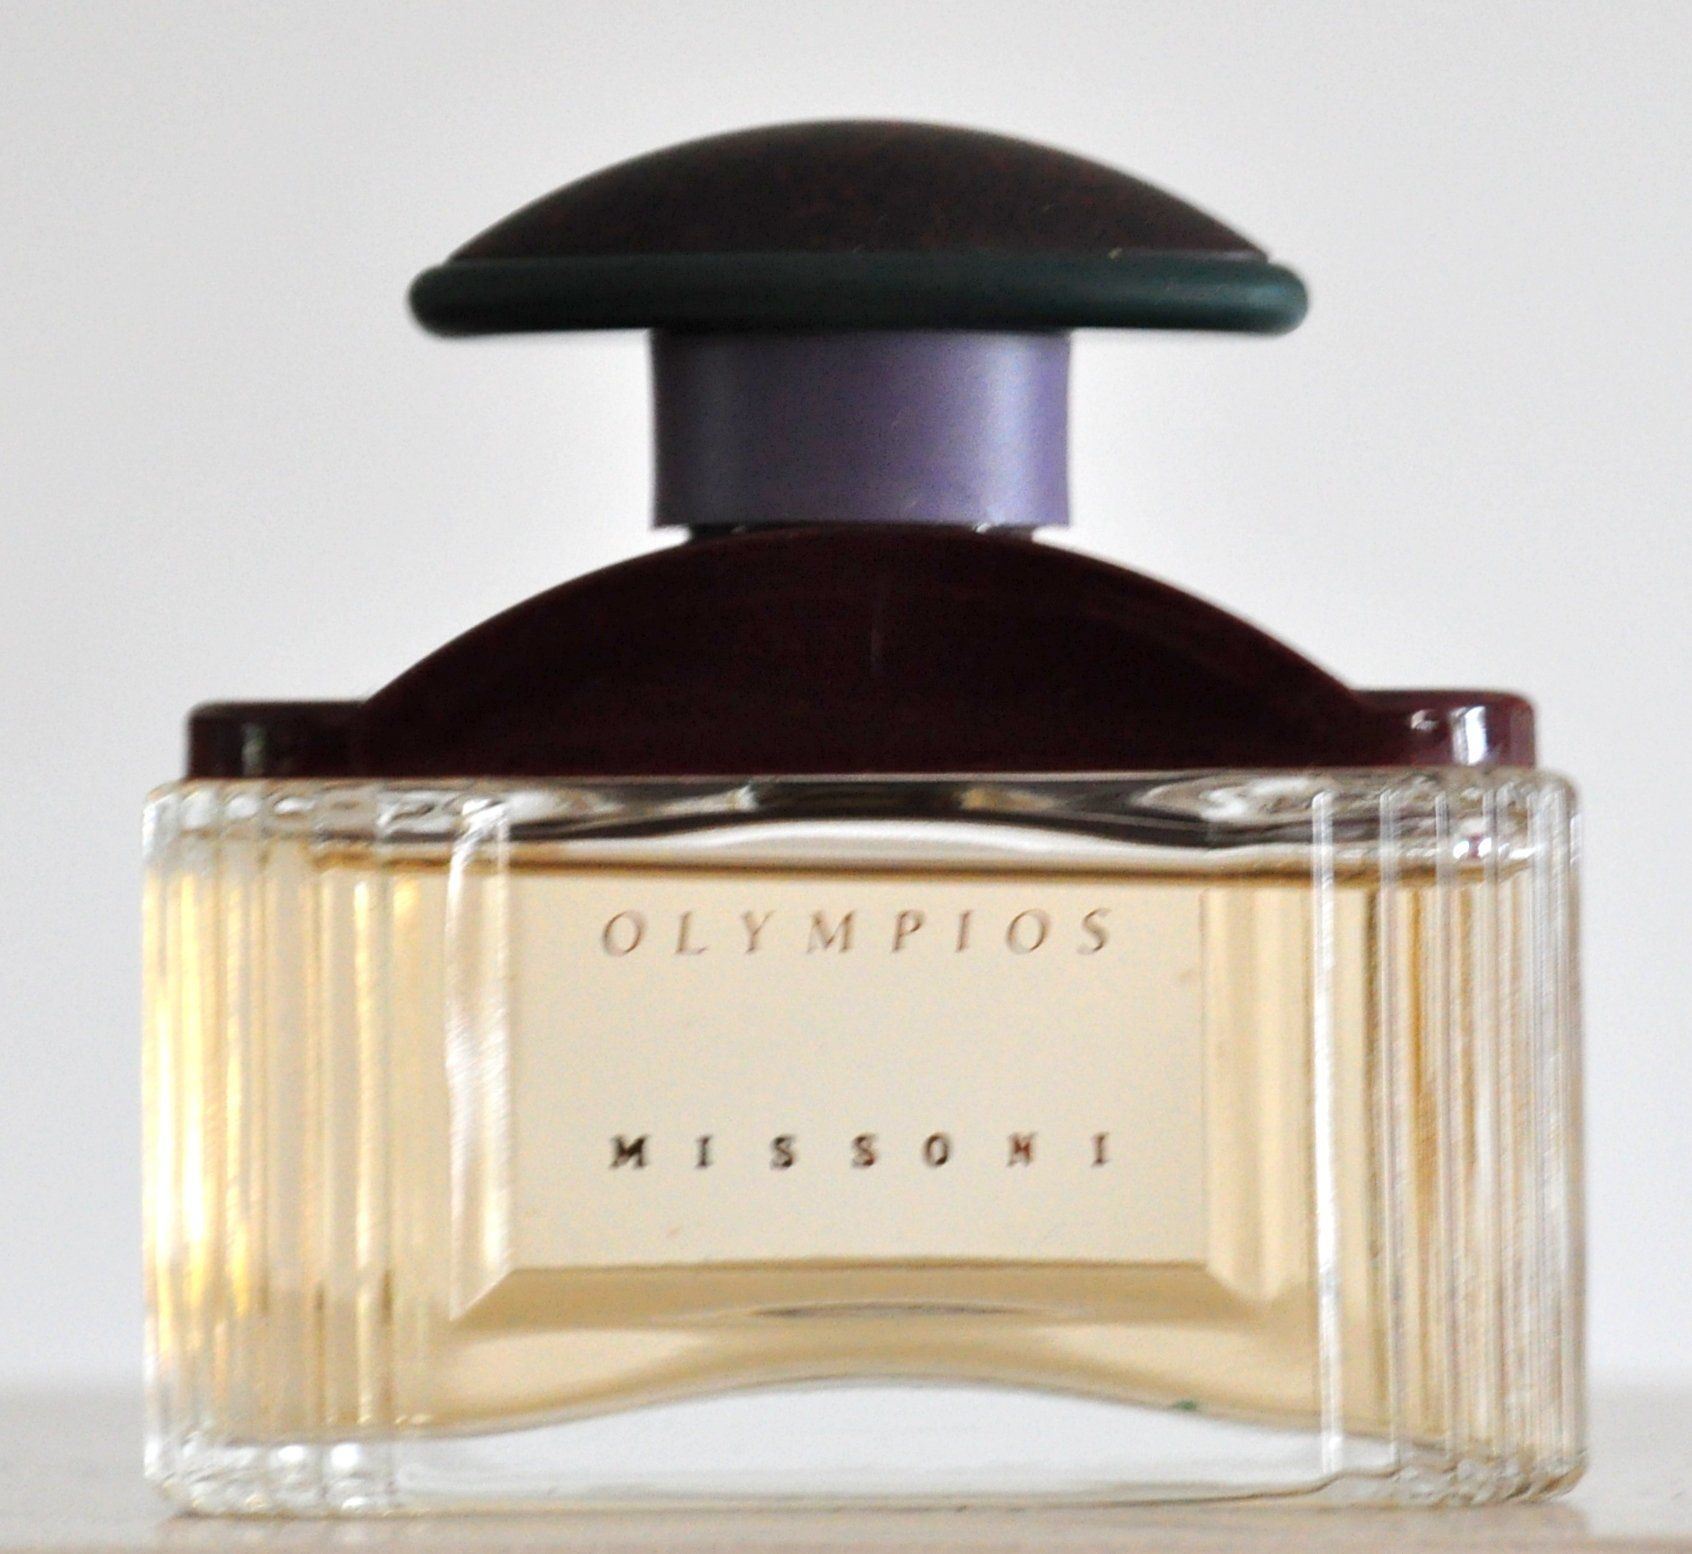 uk availability 3b018 3e8c0 Missoni Olympios Eau de Toilette Edt 50ML No Spray Splash ...